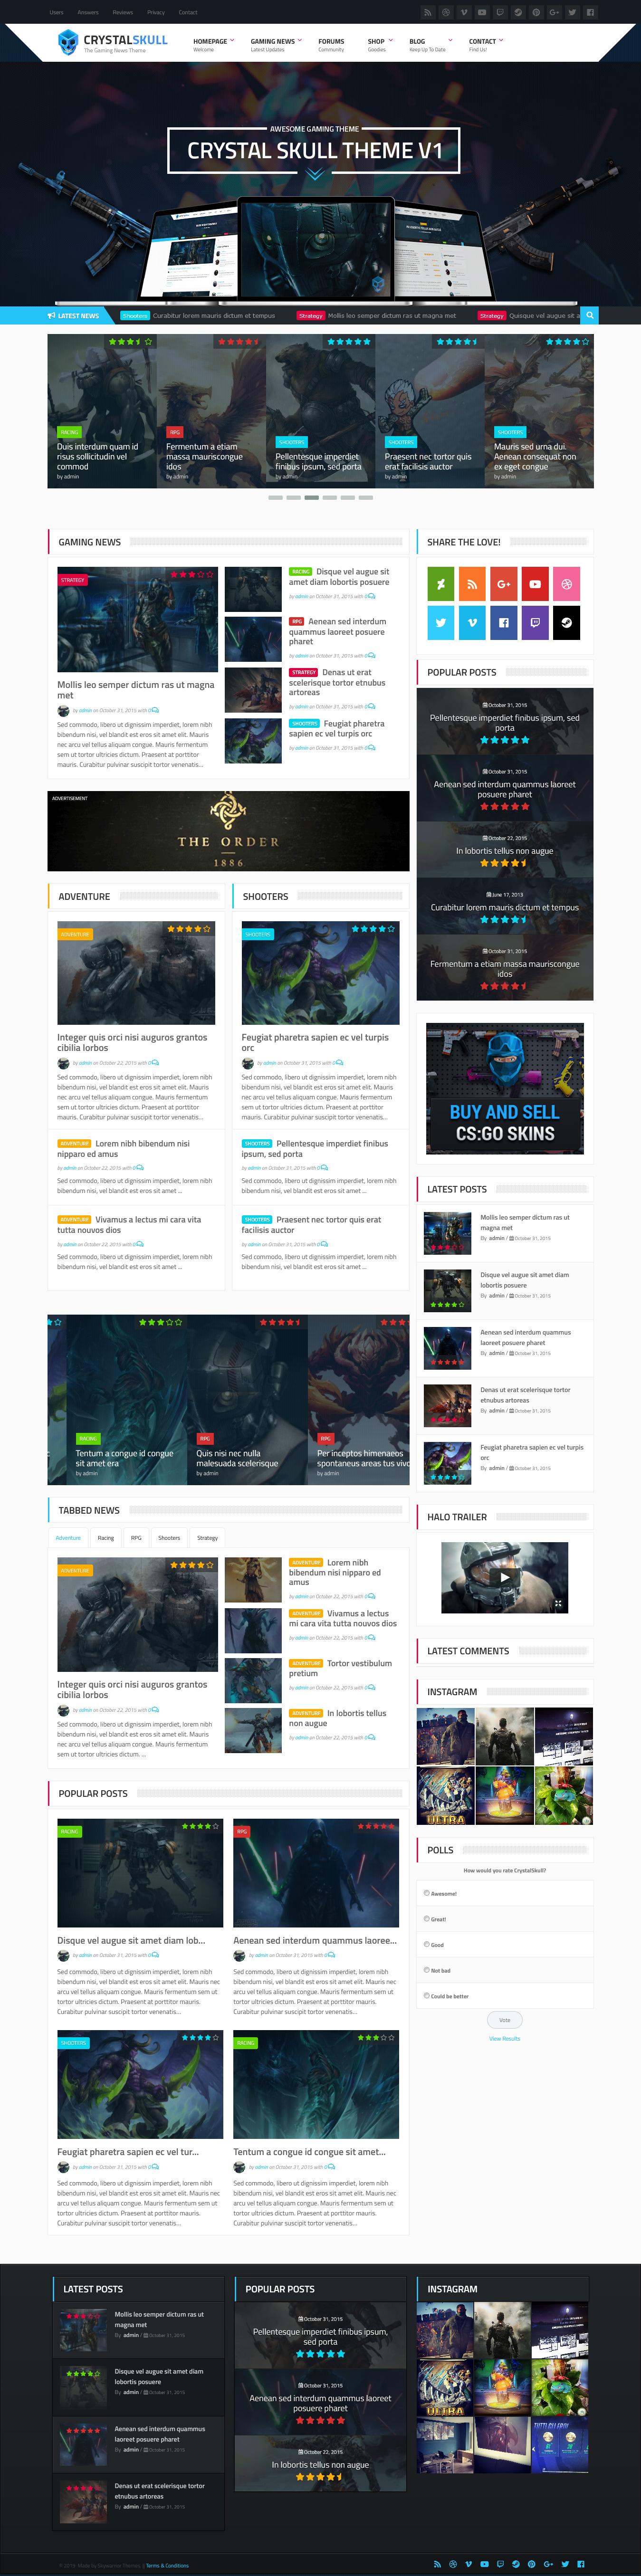 crystalskull best premium gaming wordpress theme - 10+ Best Premium Gaming WordPress Themes